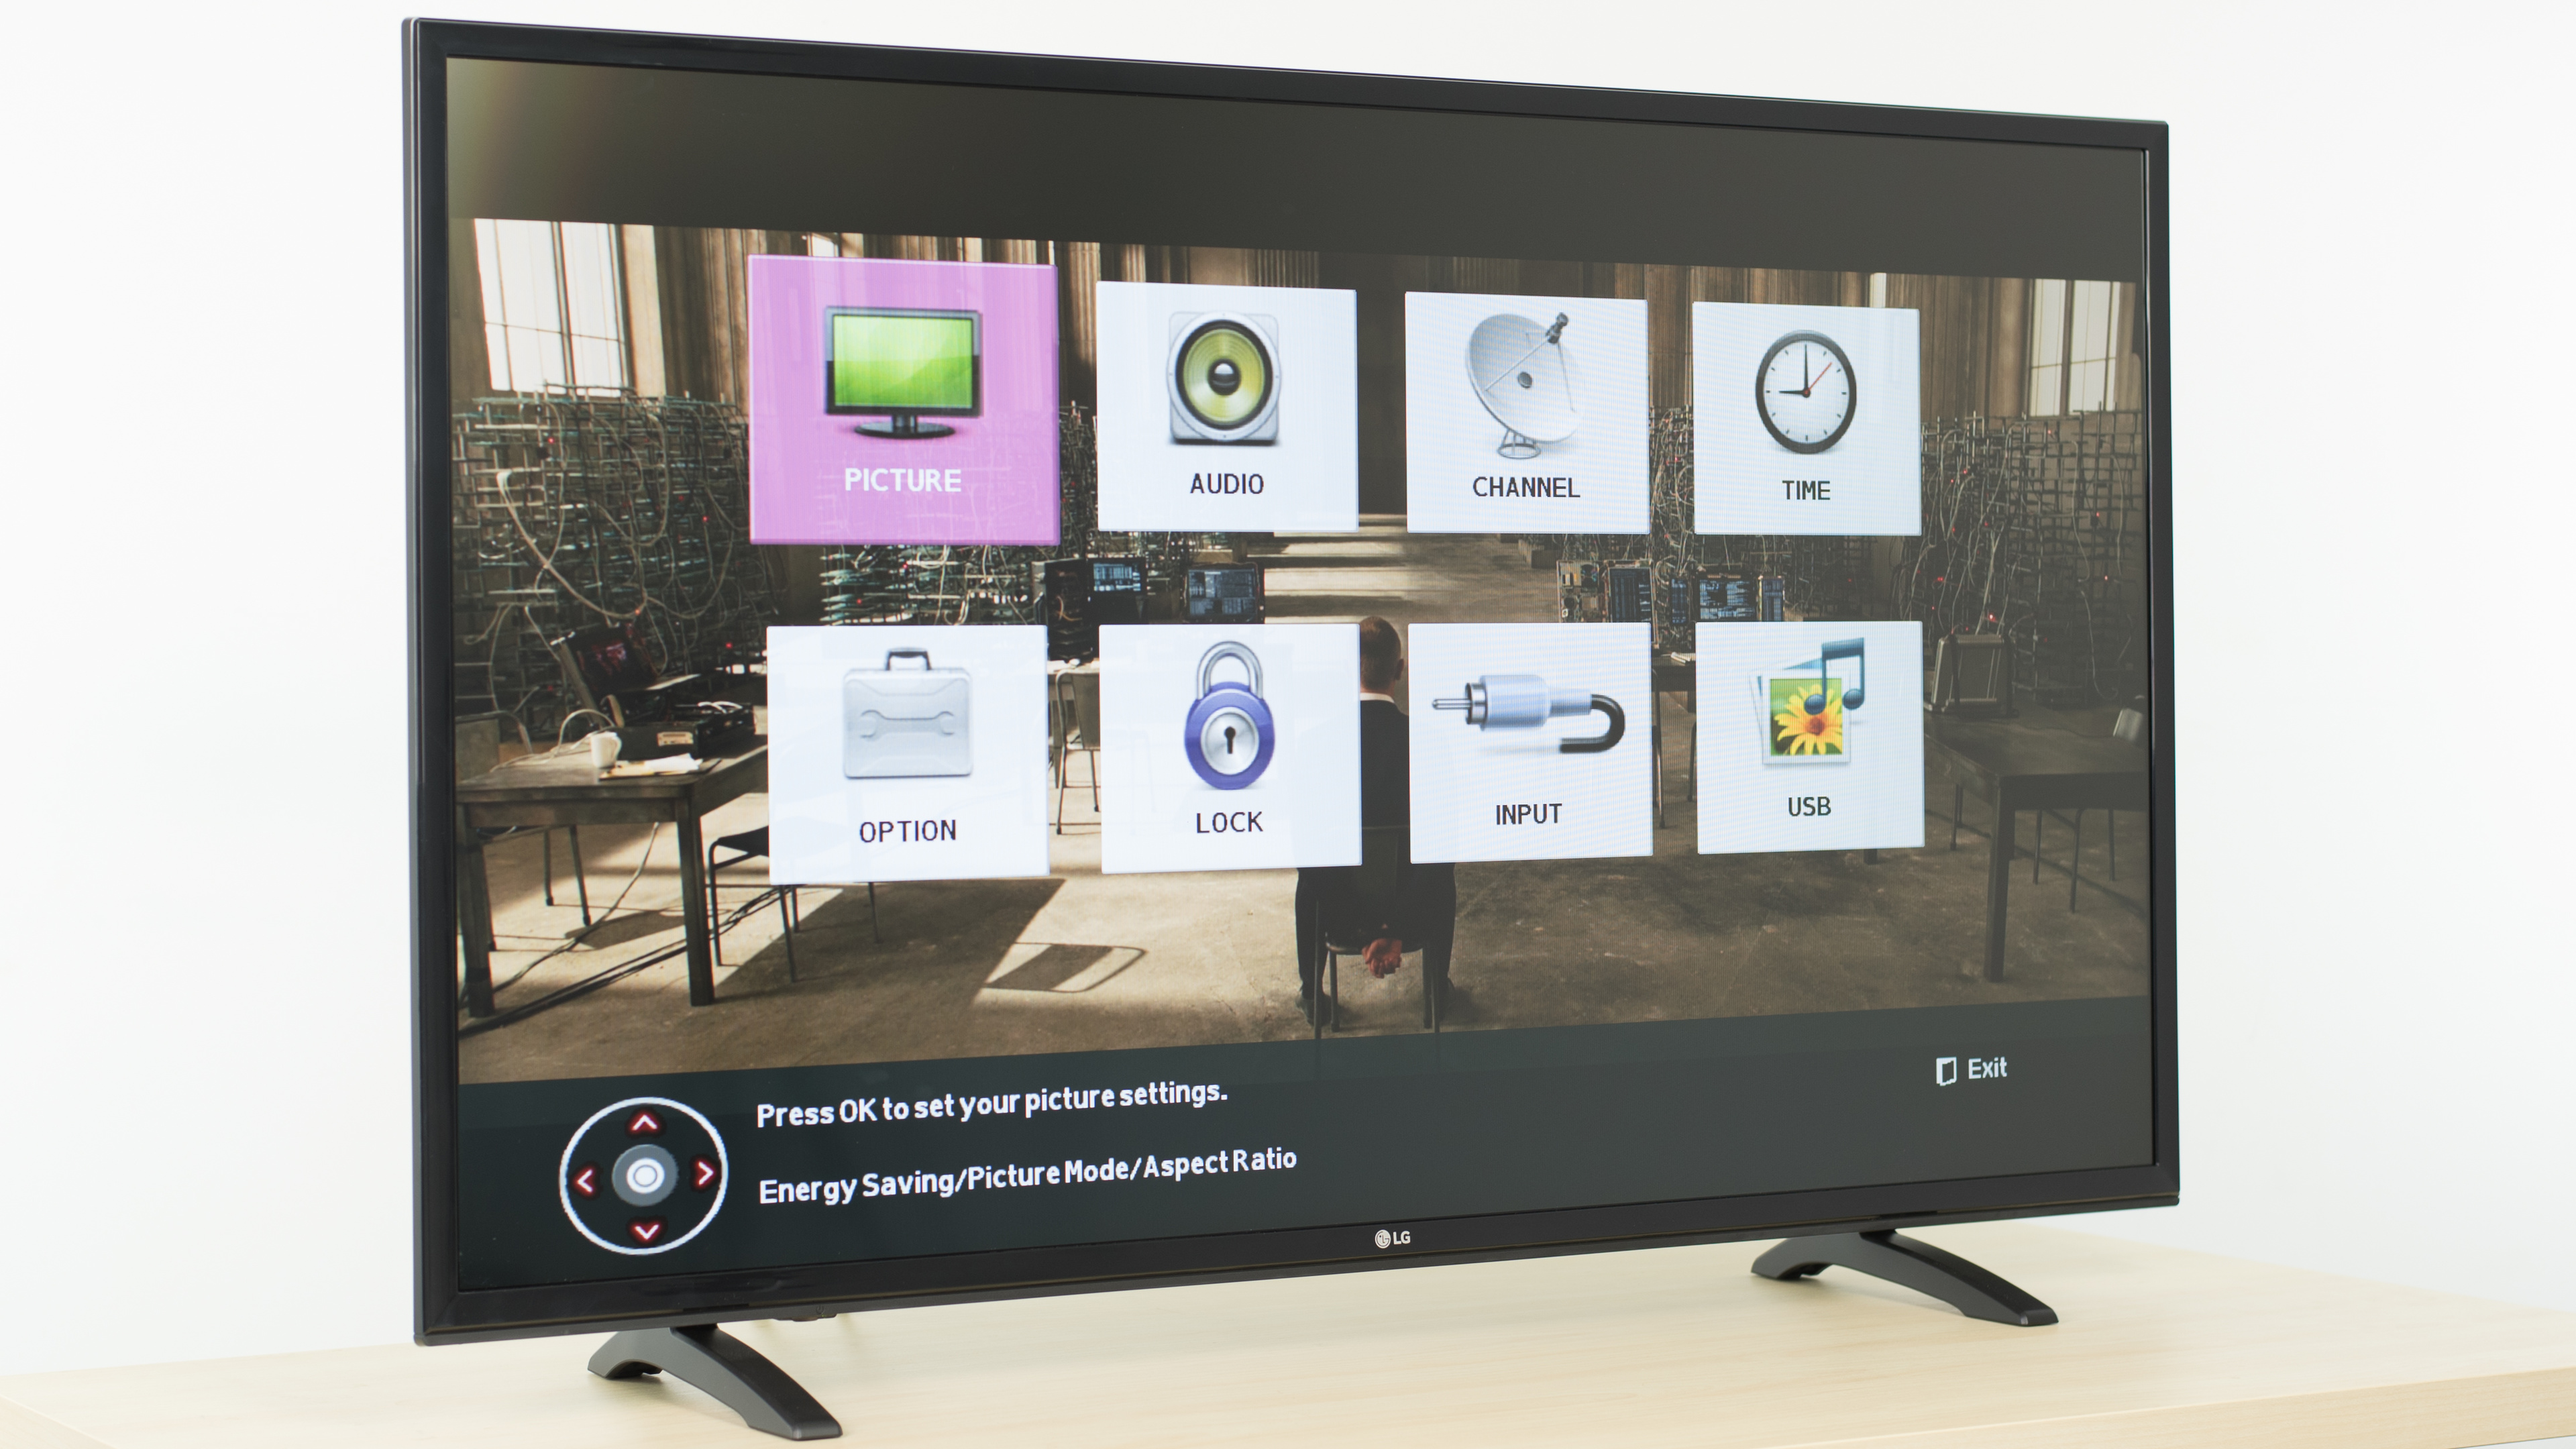 LG LH5000 Review (43LH5000) - RTINGS com